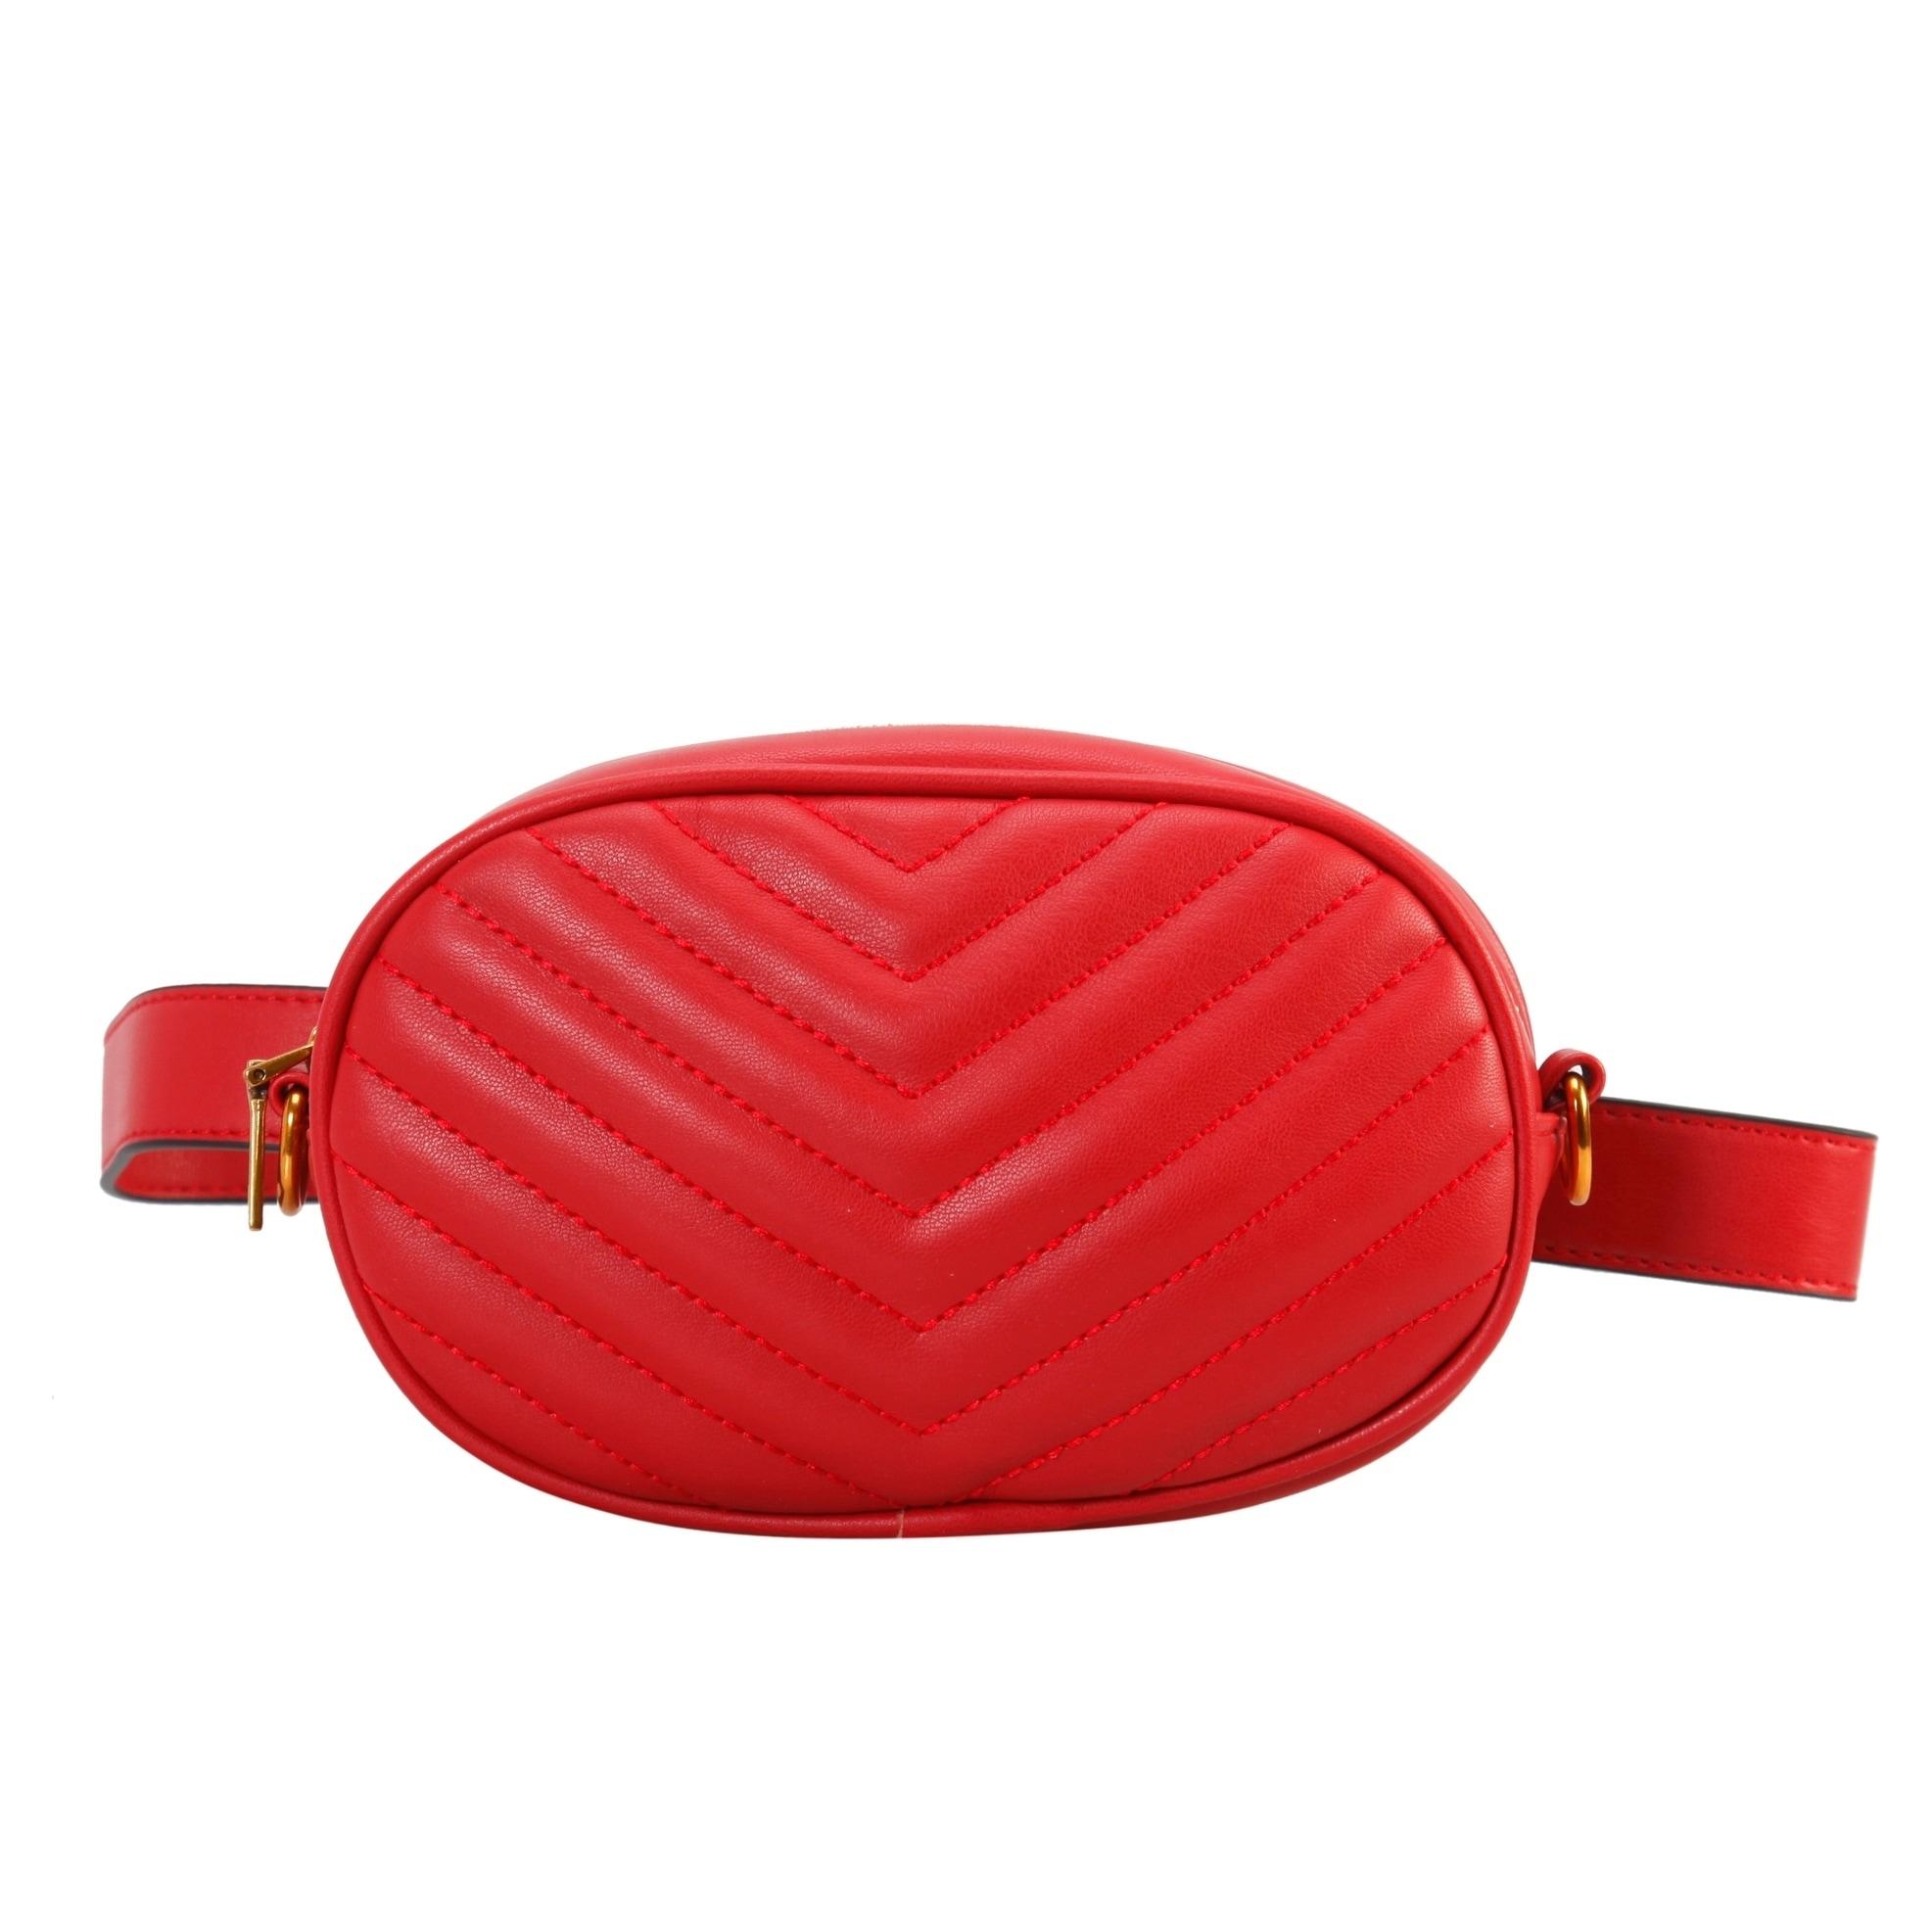 2 Ways To Wear it Womens Waist Bag Shoulder Crossbody Belt Bag Fanny Pack Black